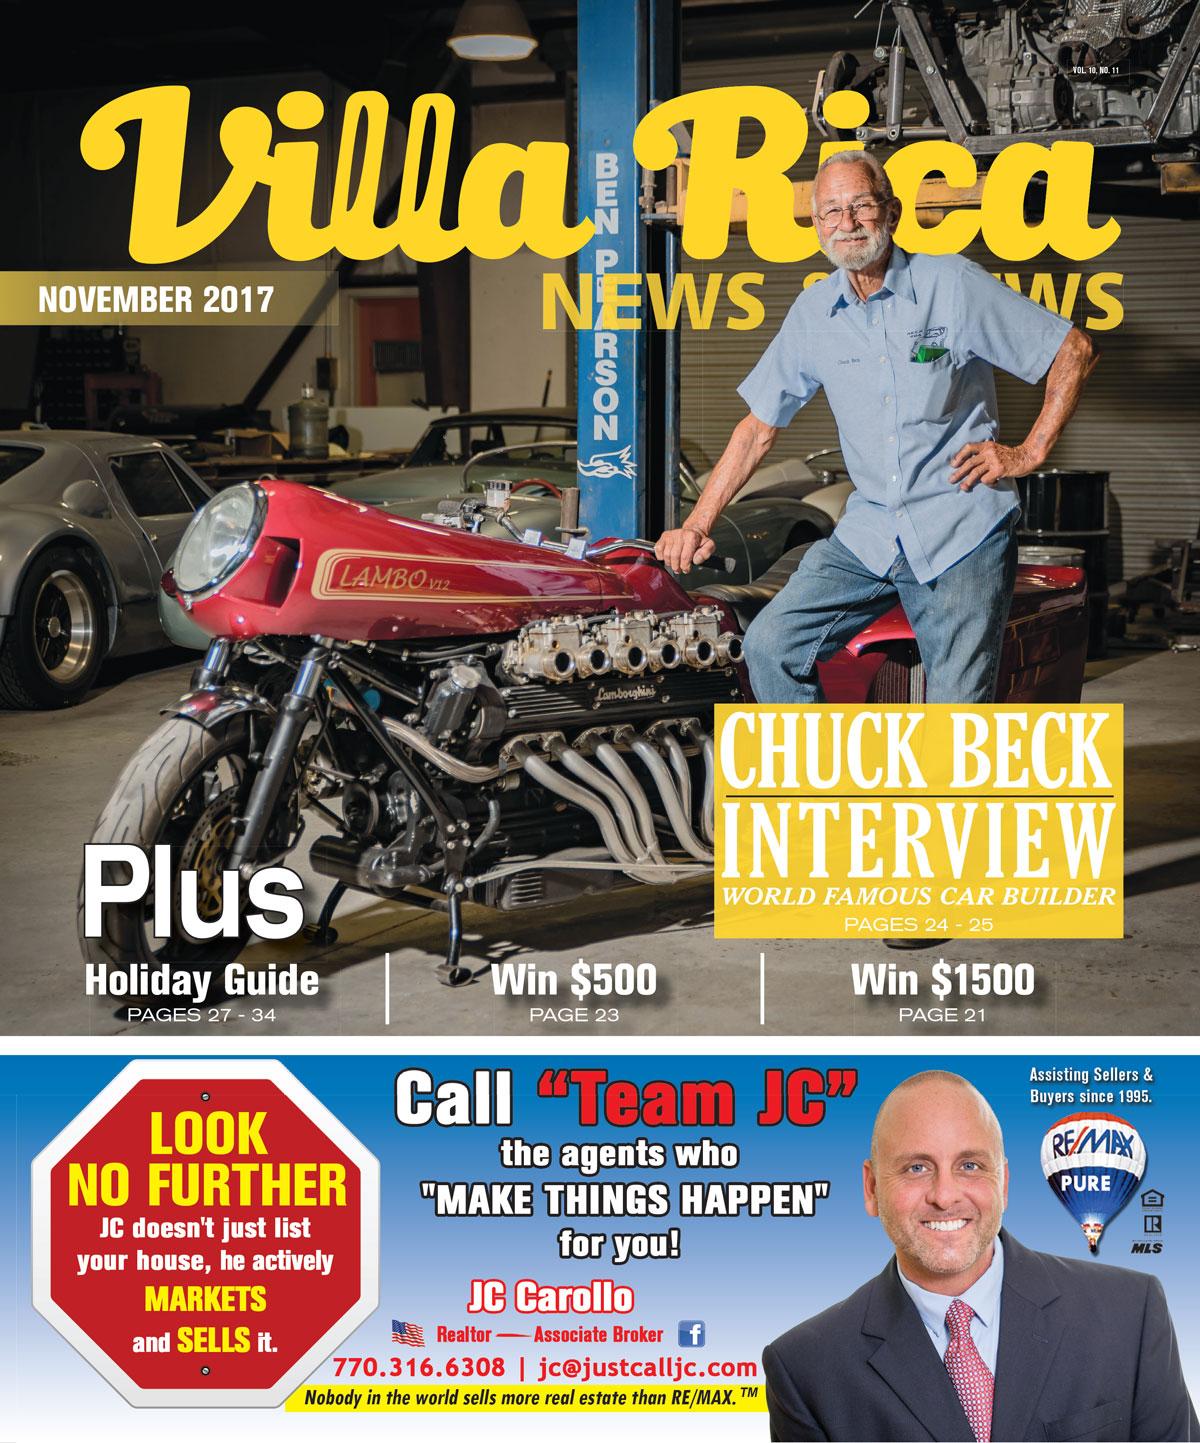 November 2017 issue of Villa Rica News & Views